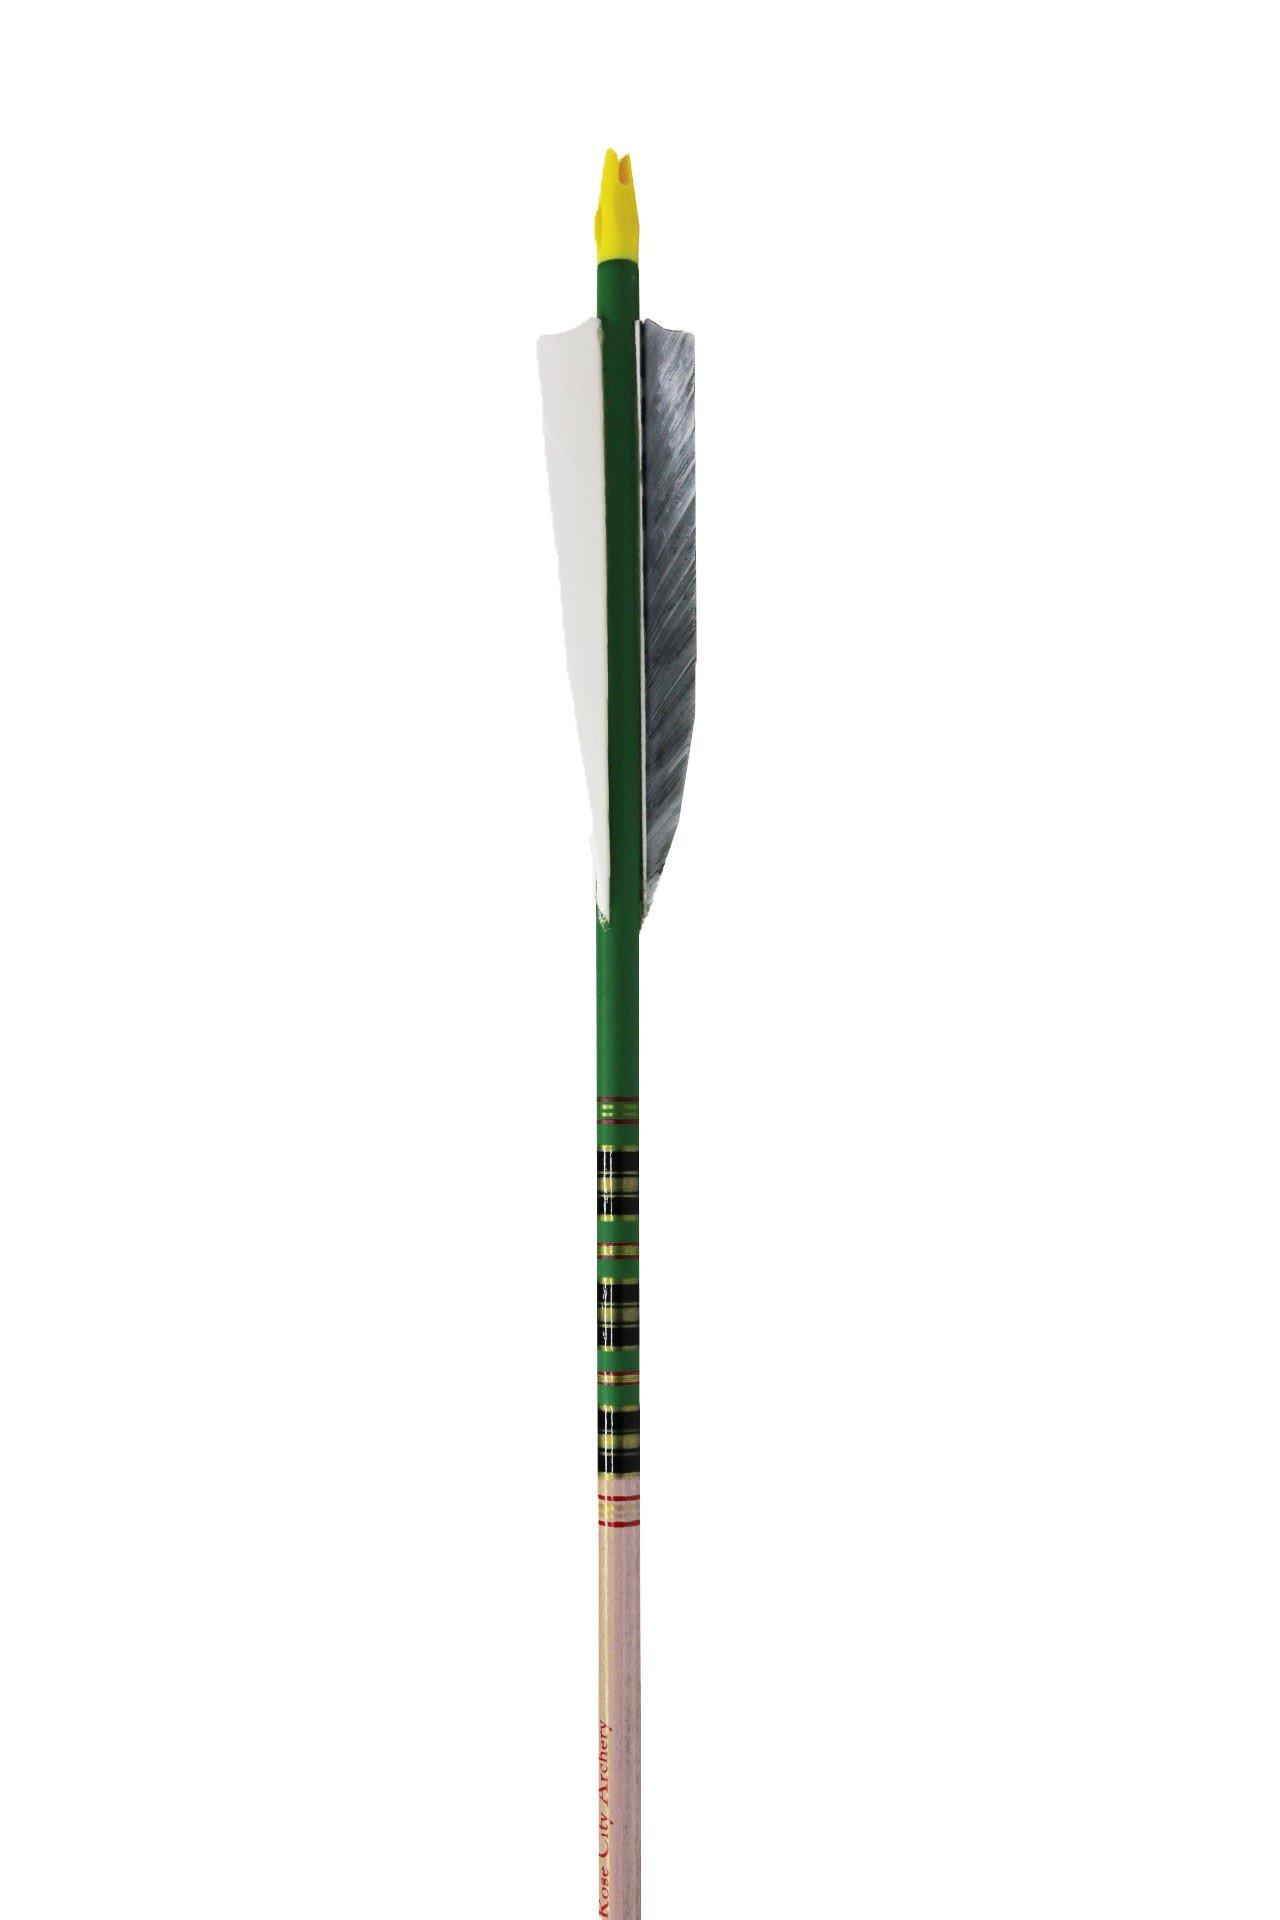 Rose City Archery Port Orford Cedar Fancy Arrows with 4'' Shield Fletch (12 Pack), Green/Clear